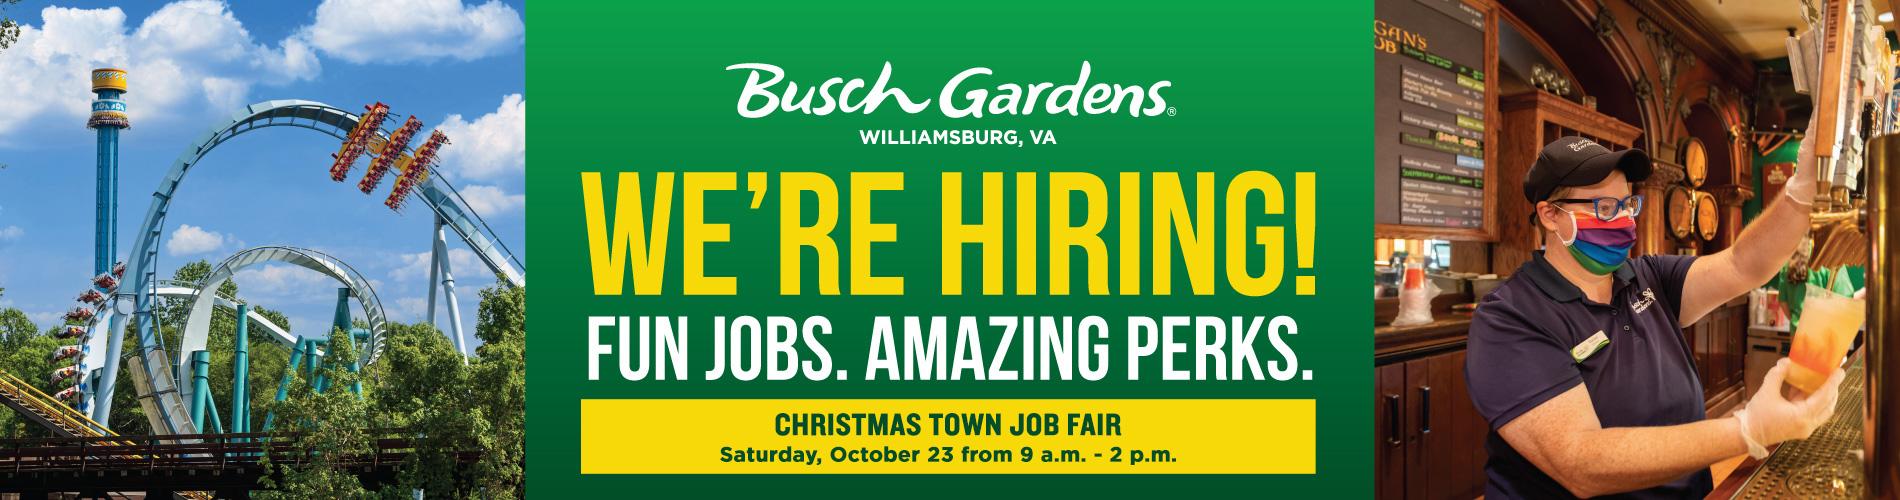 Busch Gardens Williamsburg Job Opportunities